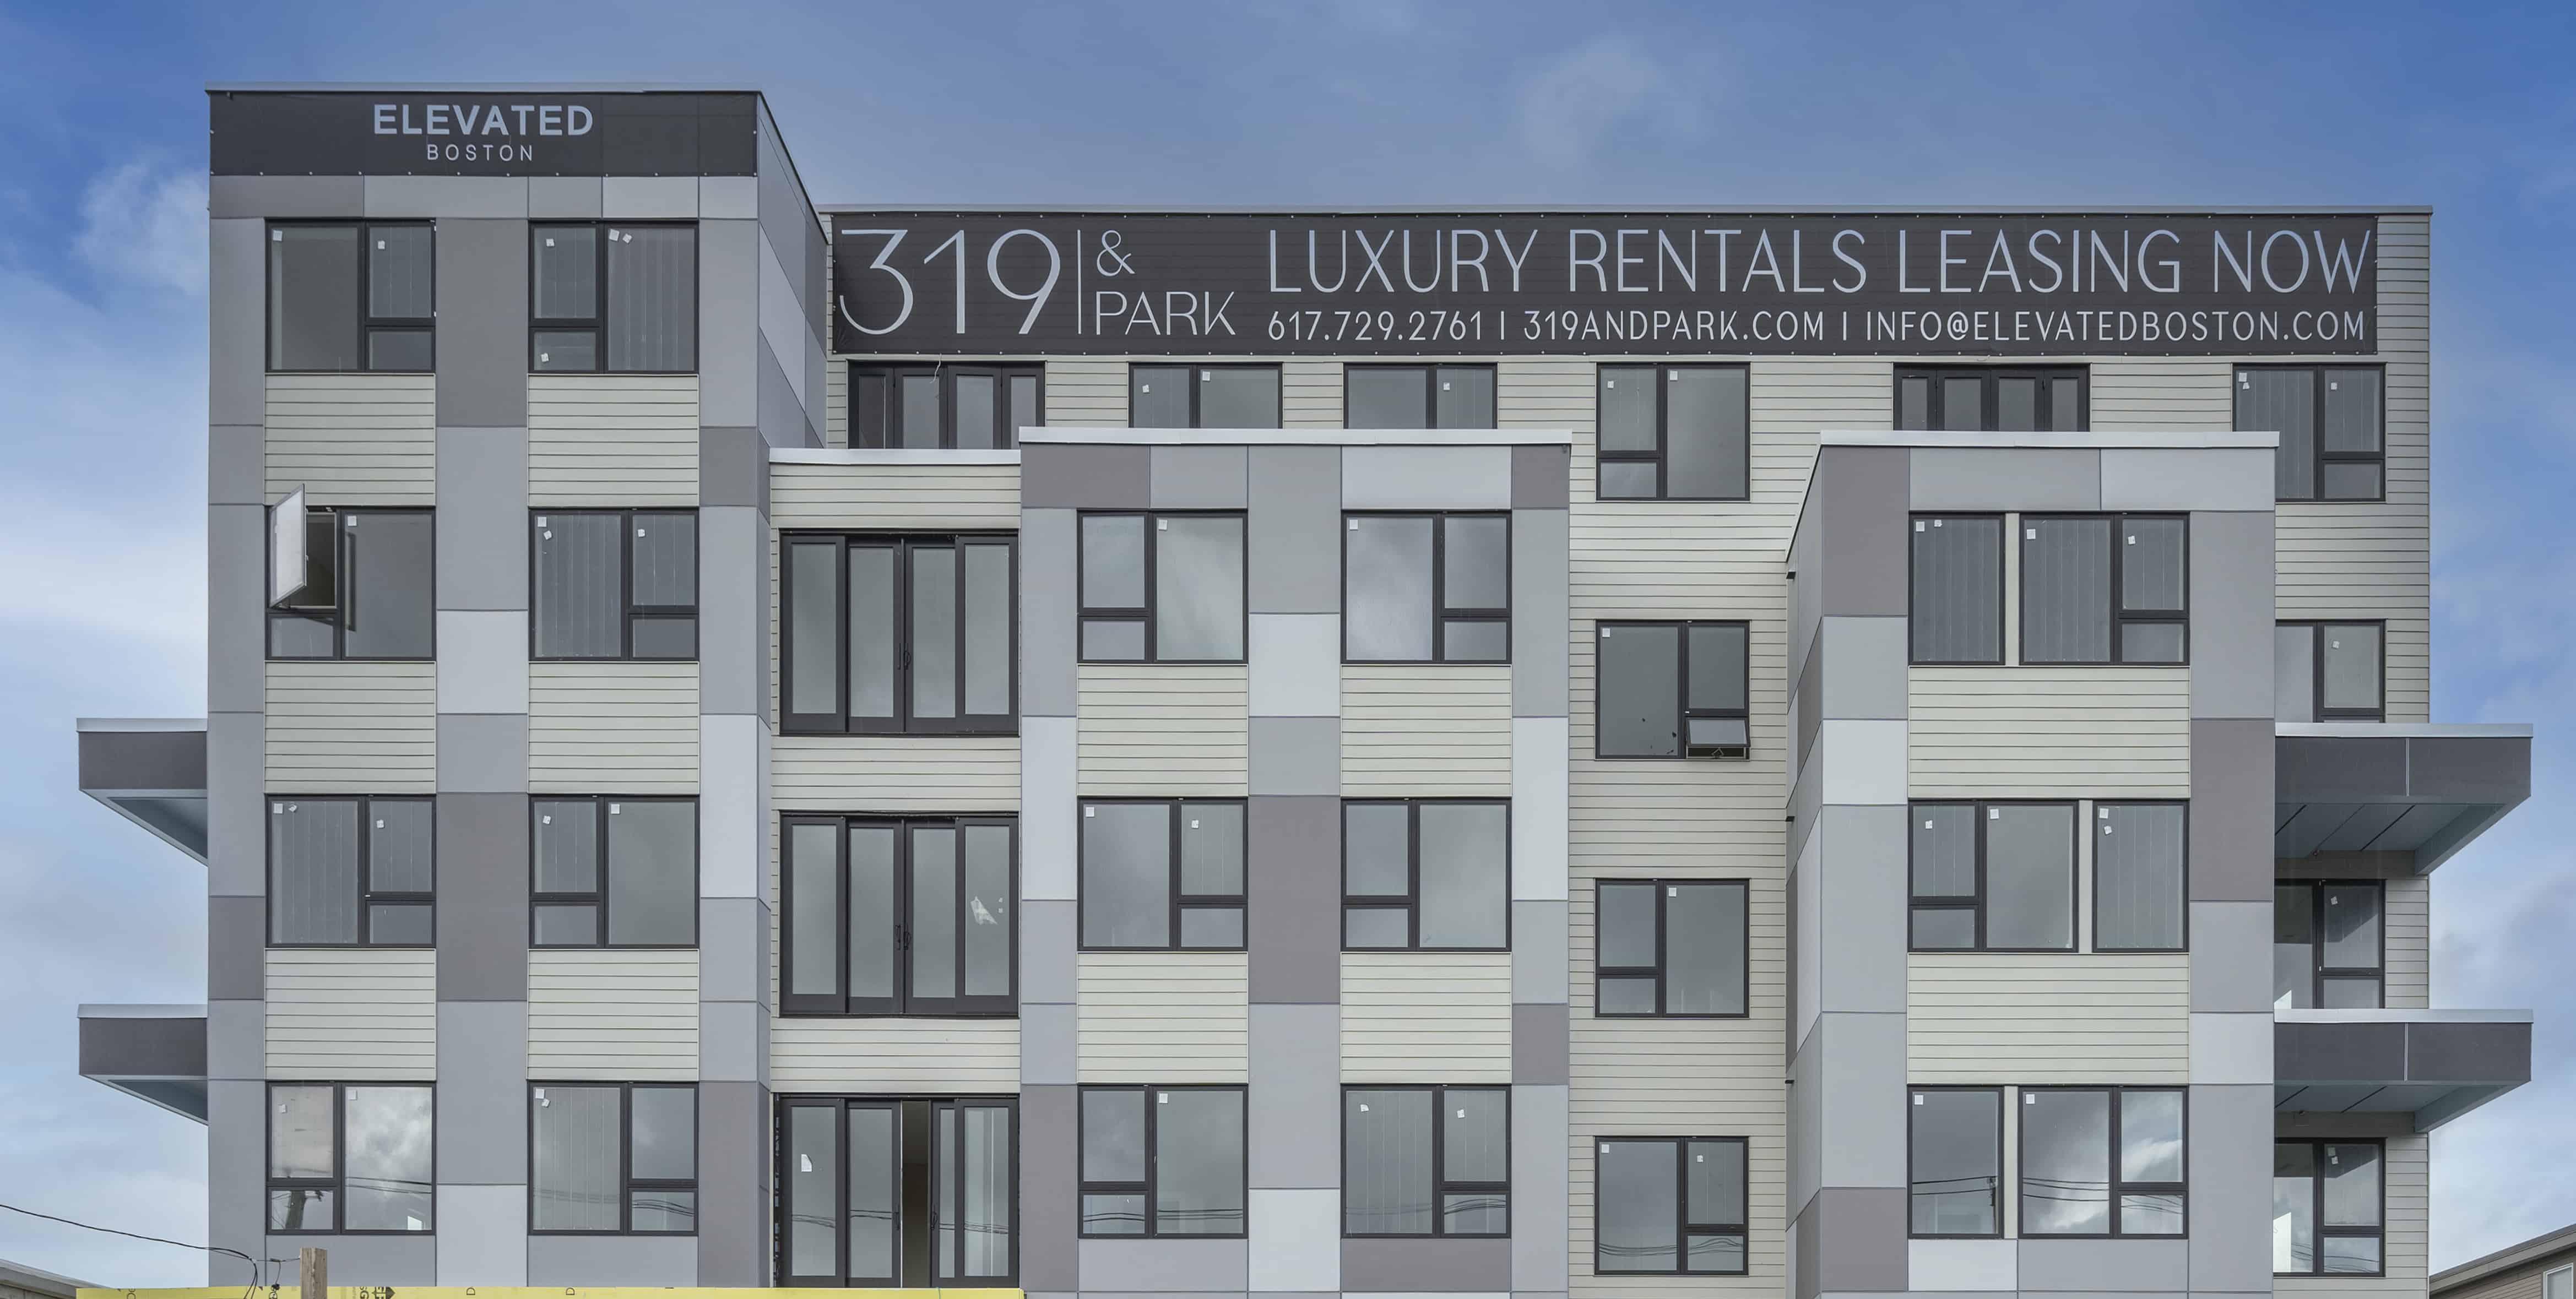 319 & Park | East Boston Luxury Rentals